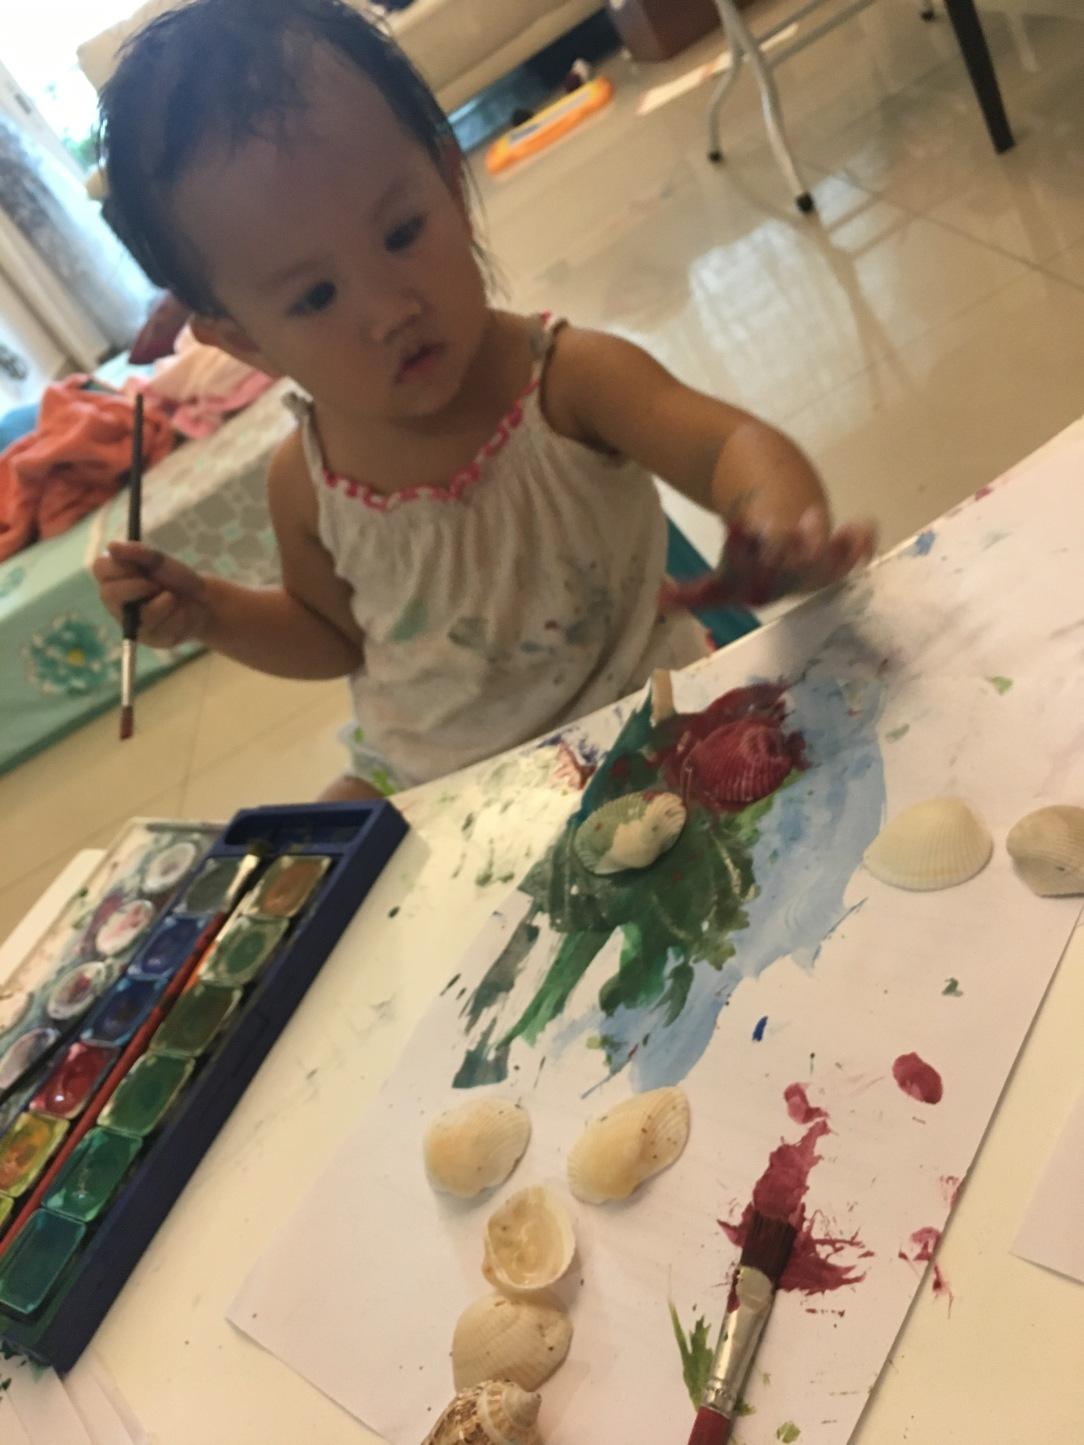 Nature walk for kids, nature toddler activity, nature rain toddler, vitamin N book review, richard louv